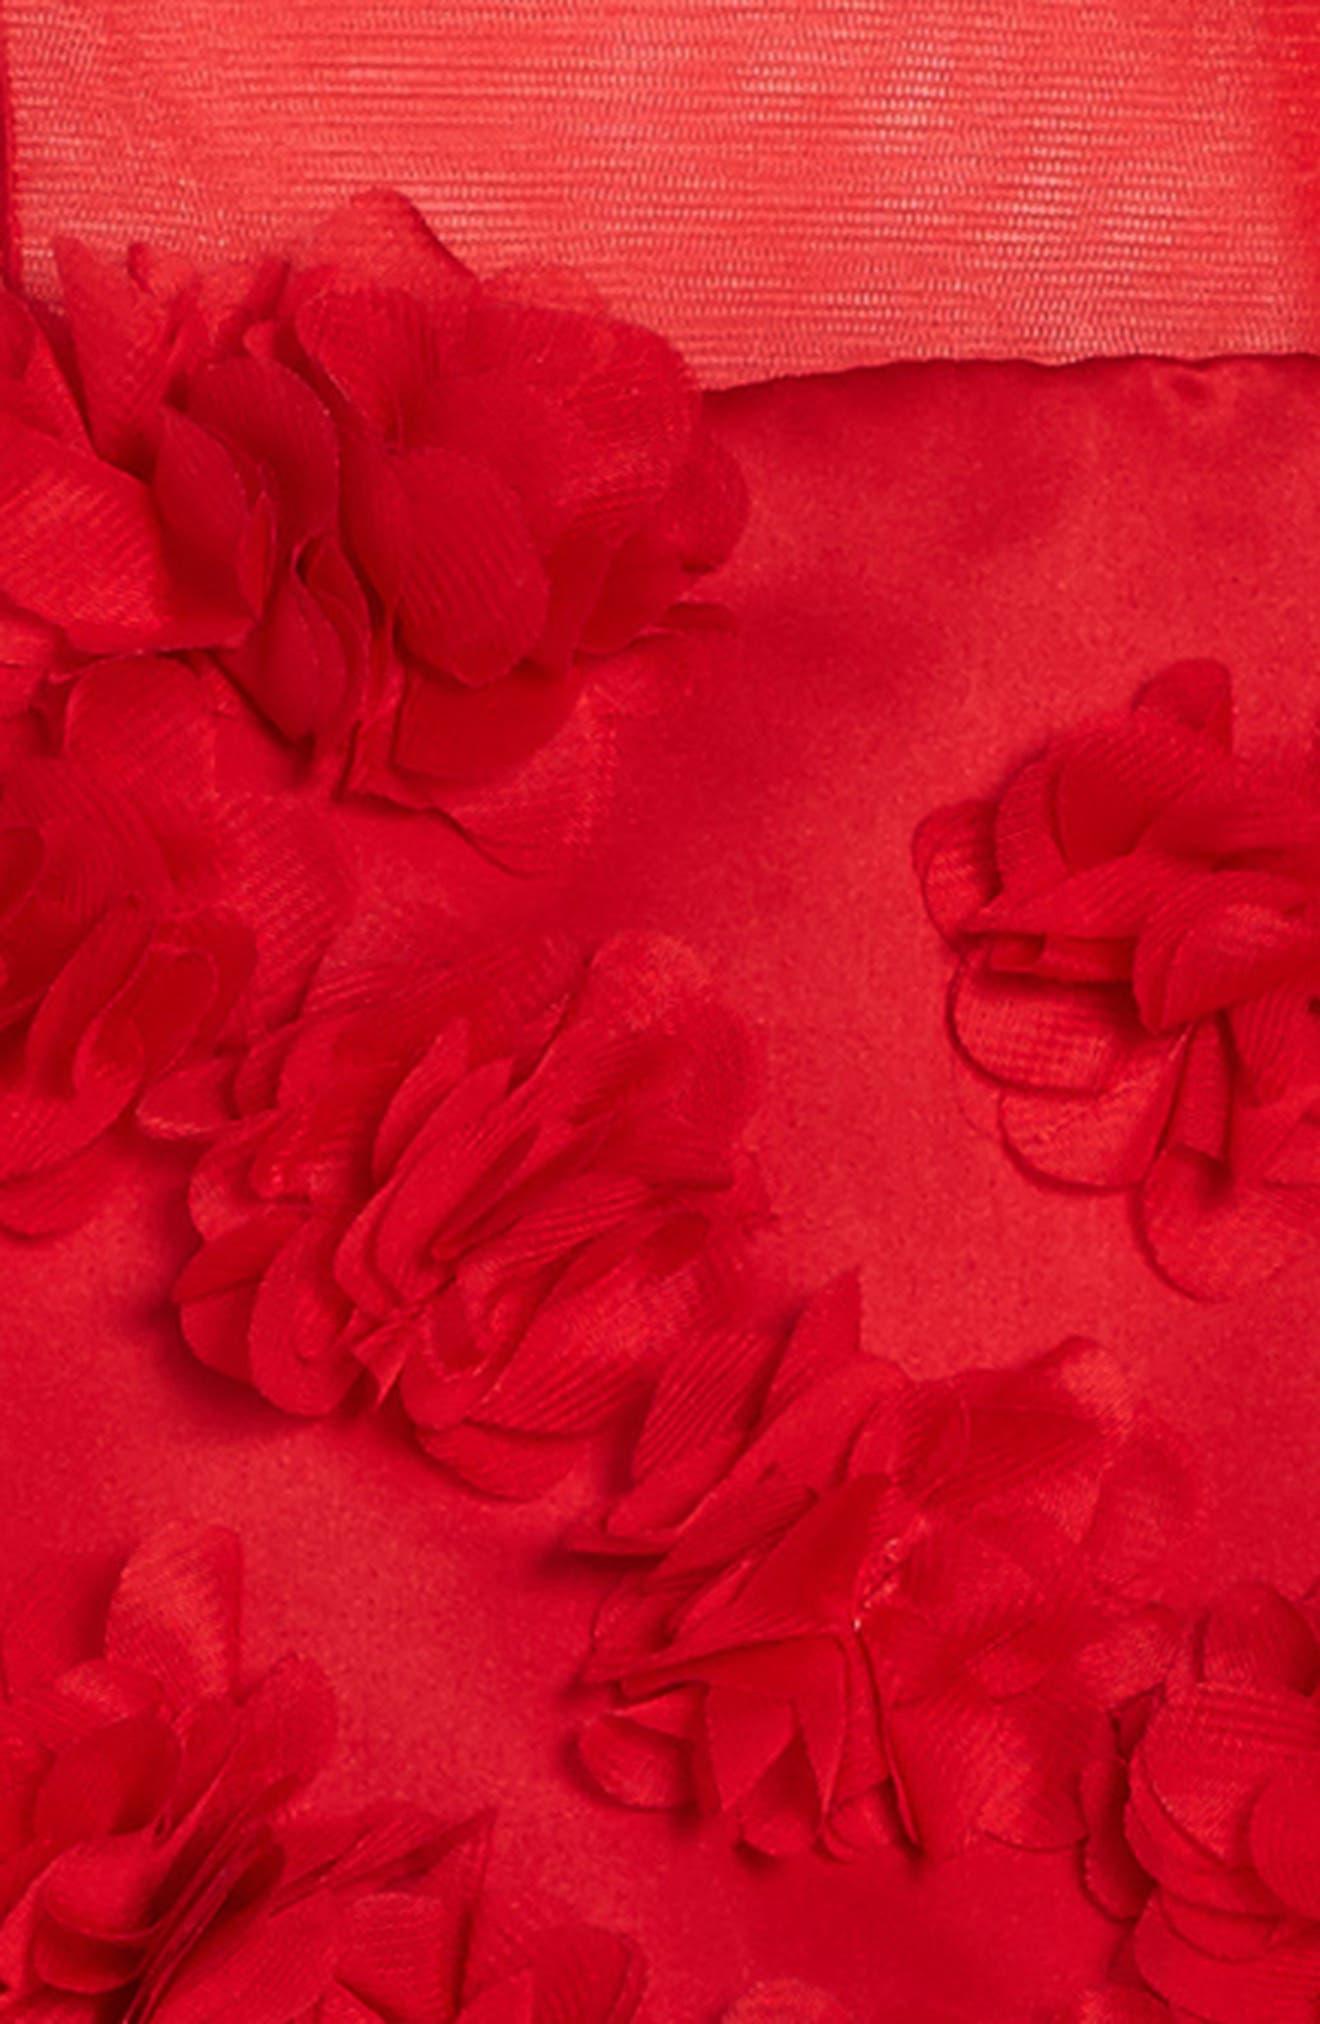 Floral Embellished Sleeveless Dress,                             Alternate thumbnail 3, color,                             Red